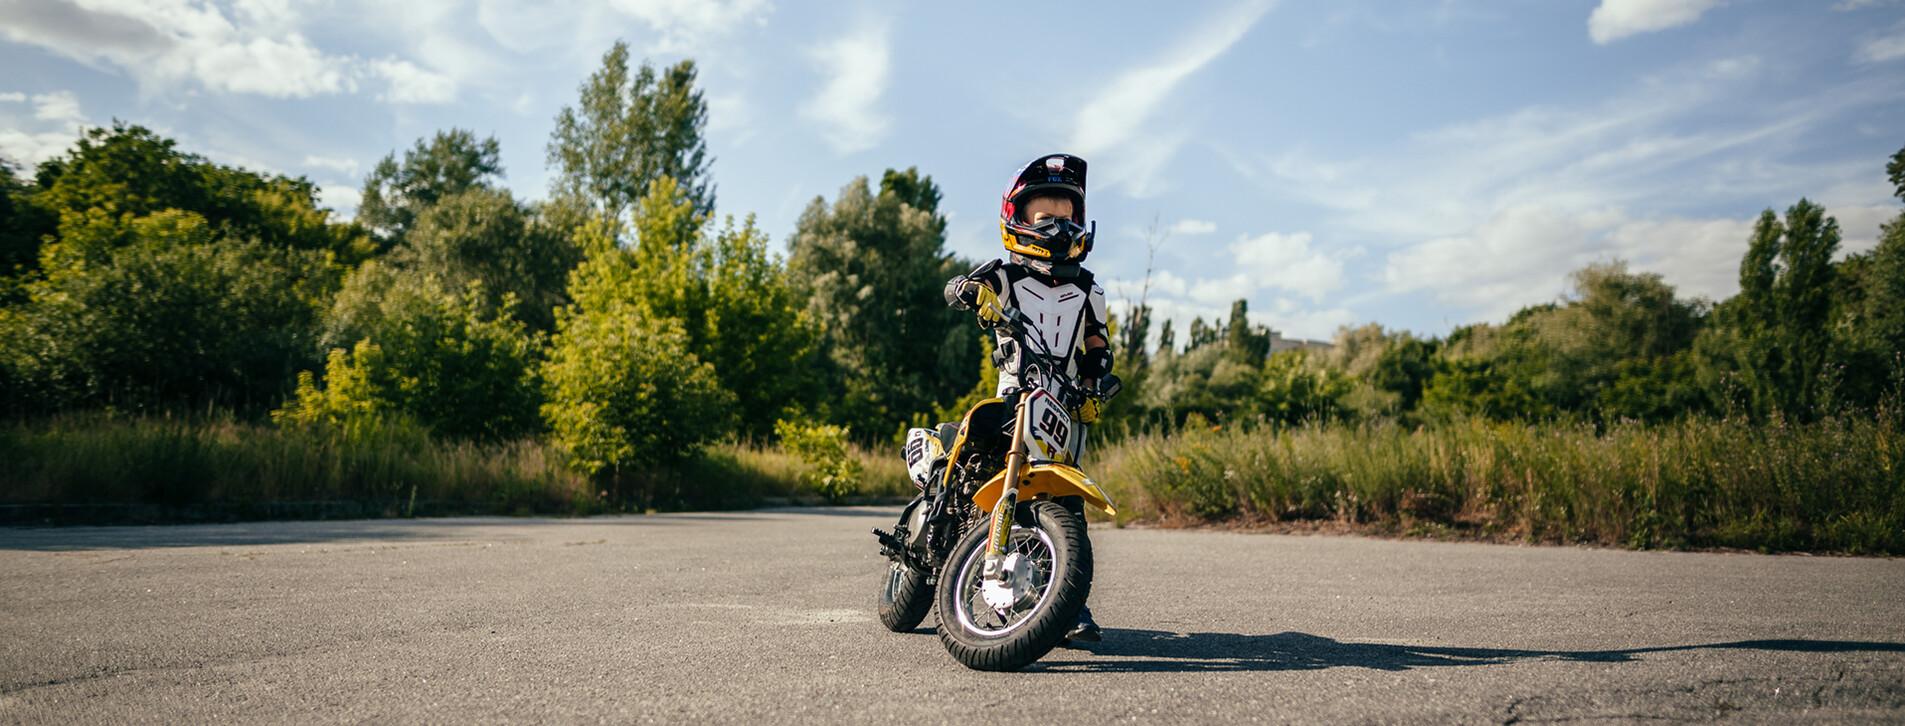 Фото 1 - Детский мастер-класс езды на мотоцикле